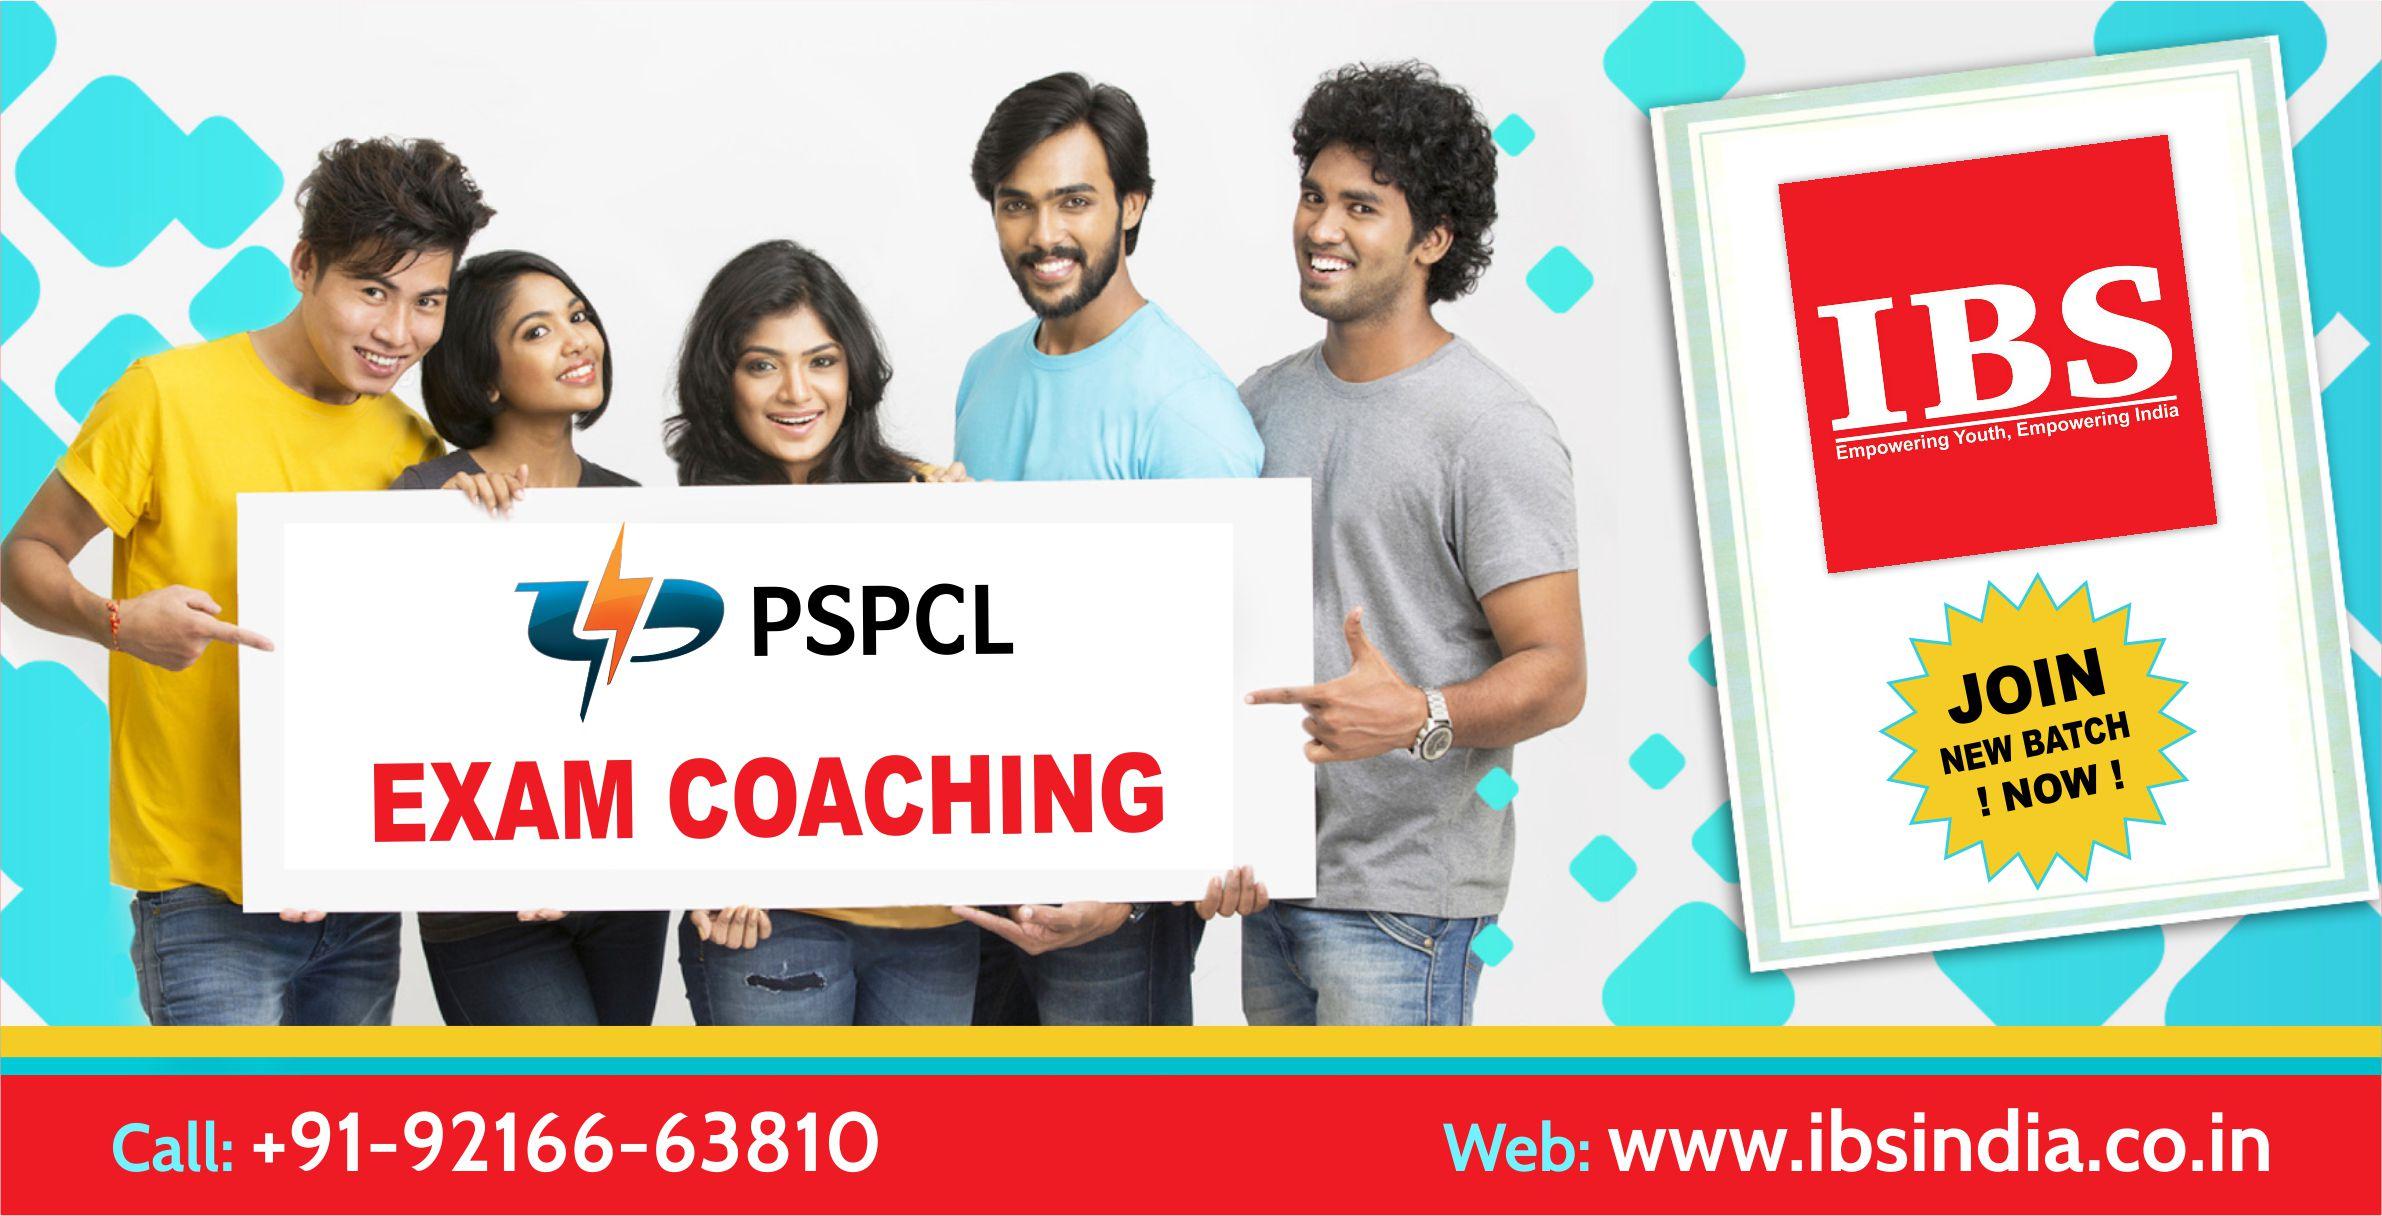 PSPCL Coaching in chandigarh